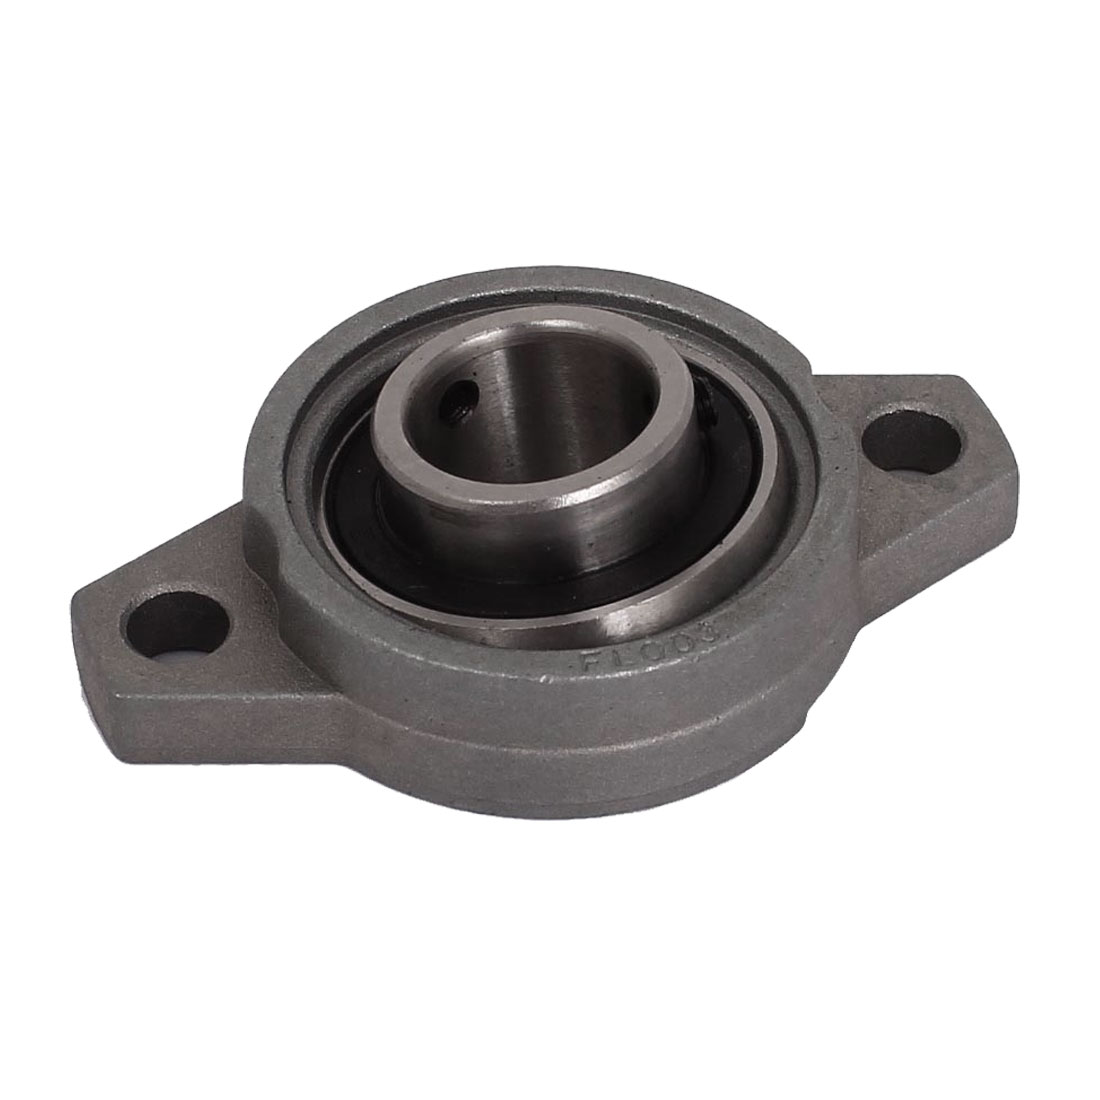 KFL003 17mm Bore Aluminum Alloy Self-aligning Flange Bearing Oval Pillow Block